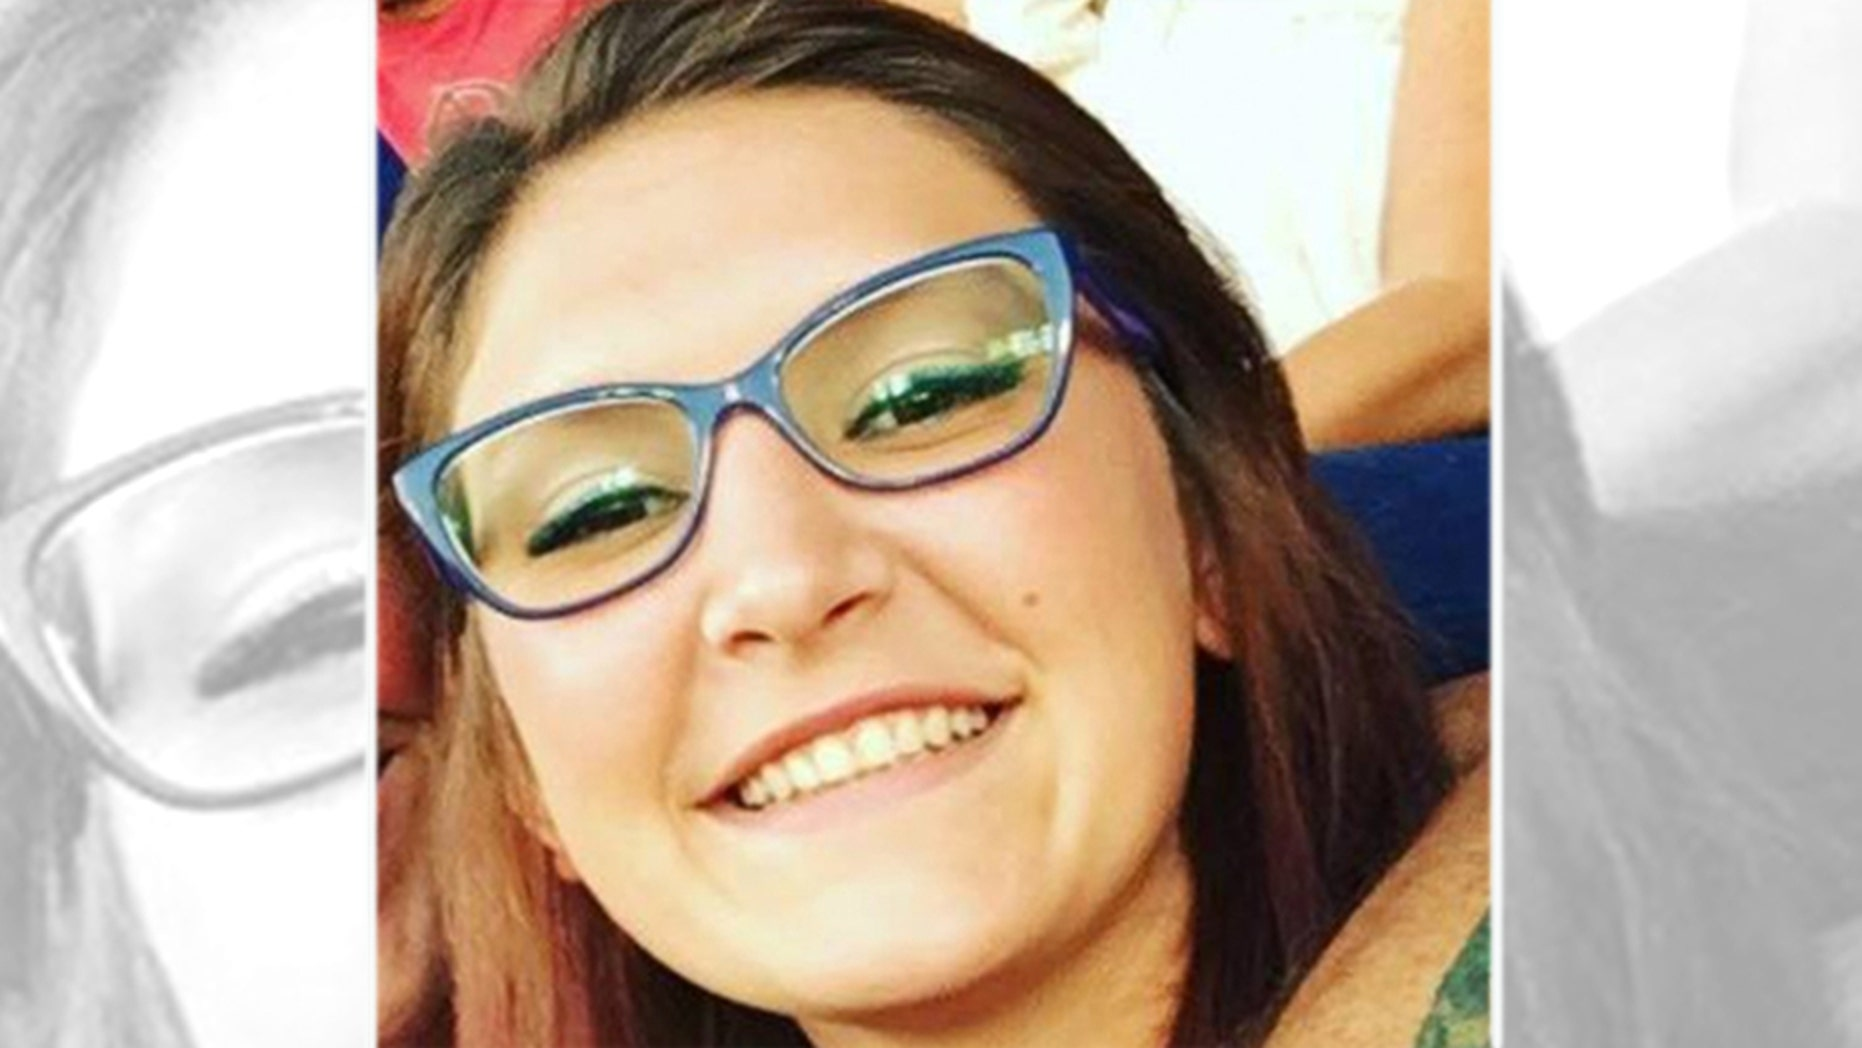 Brittany Prehn, 22, of Woodstock, Ill.